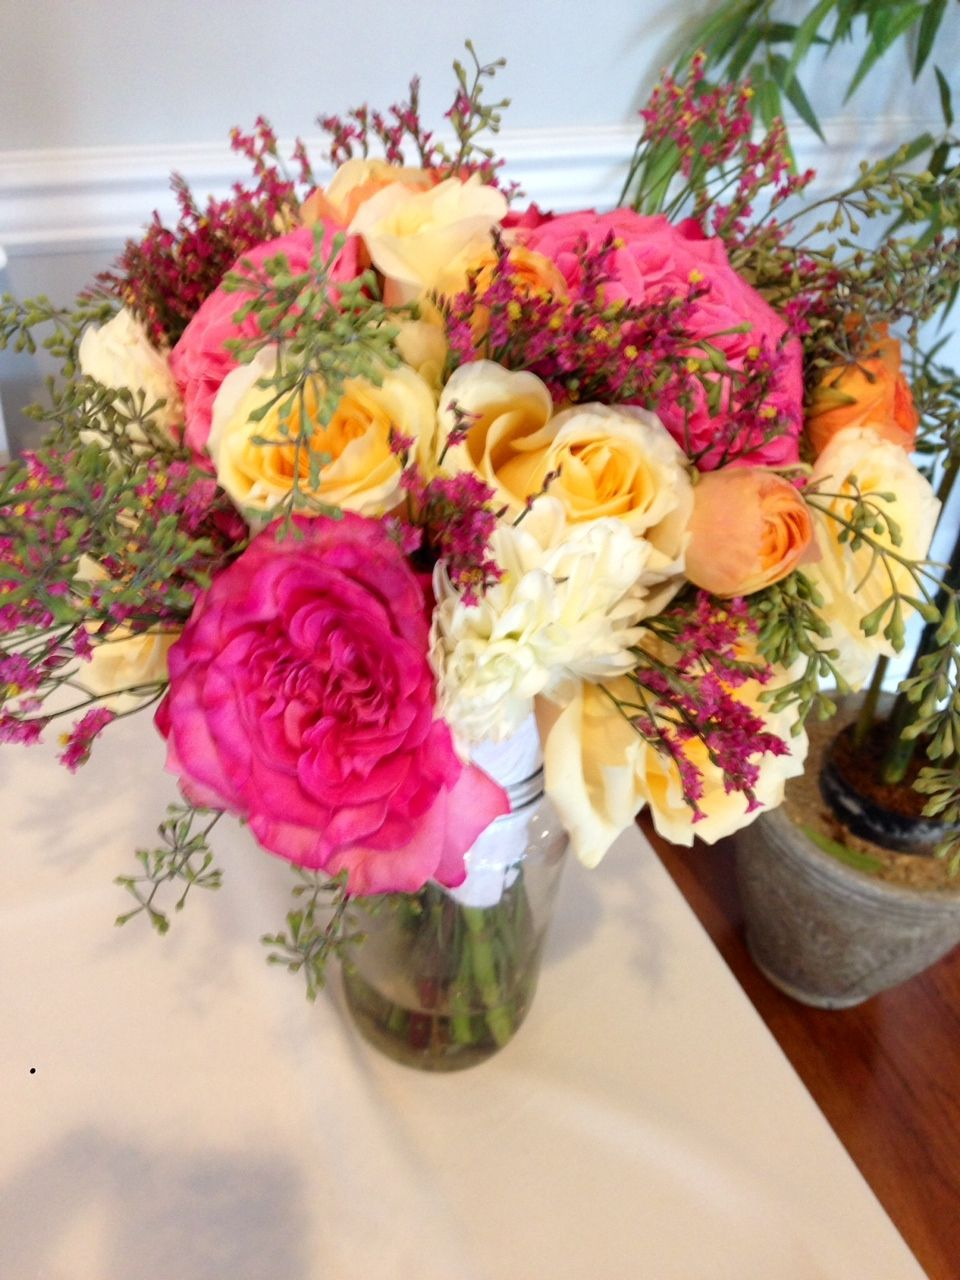 Eucalyptus seeds, garden roses, dahlia, and sweetheart roses.